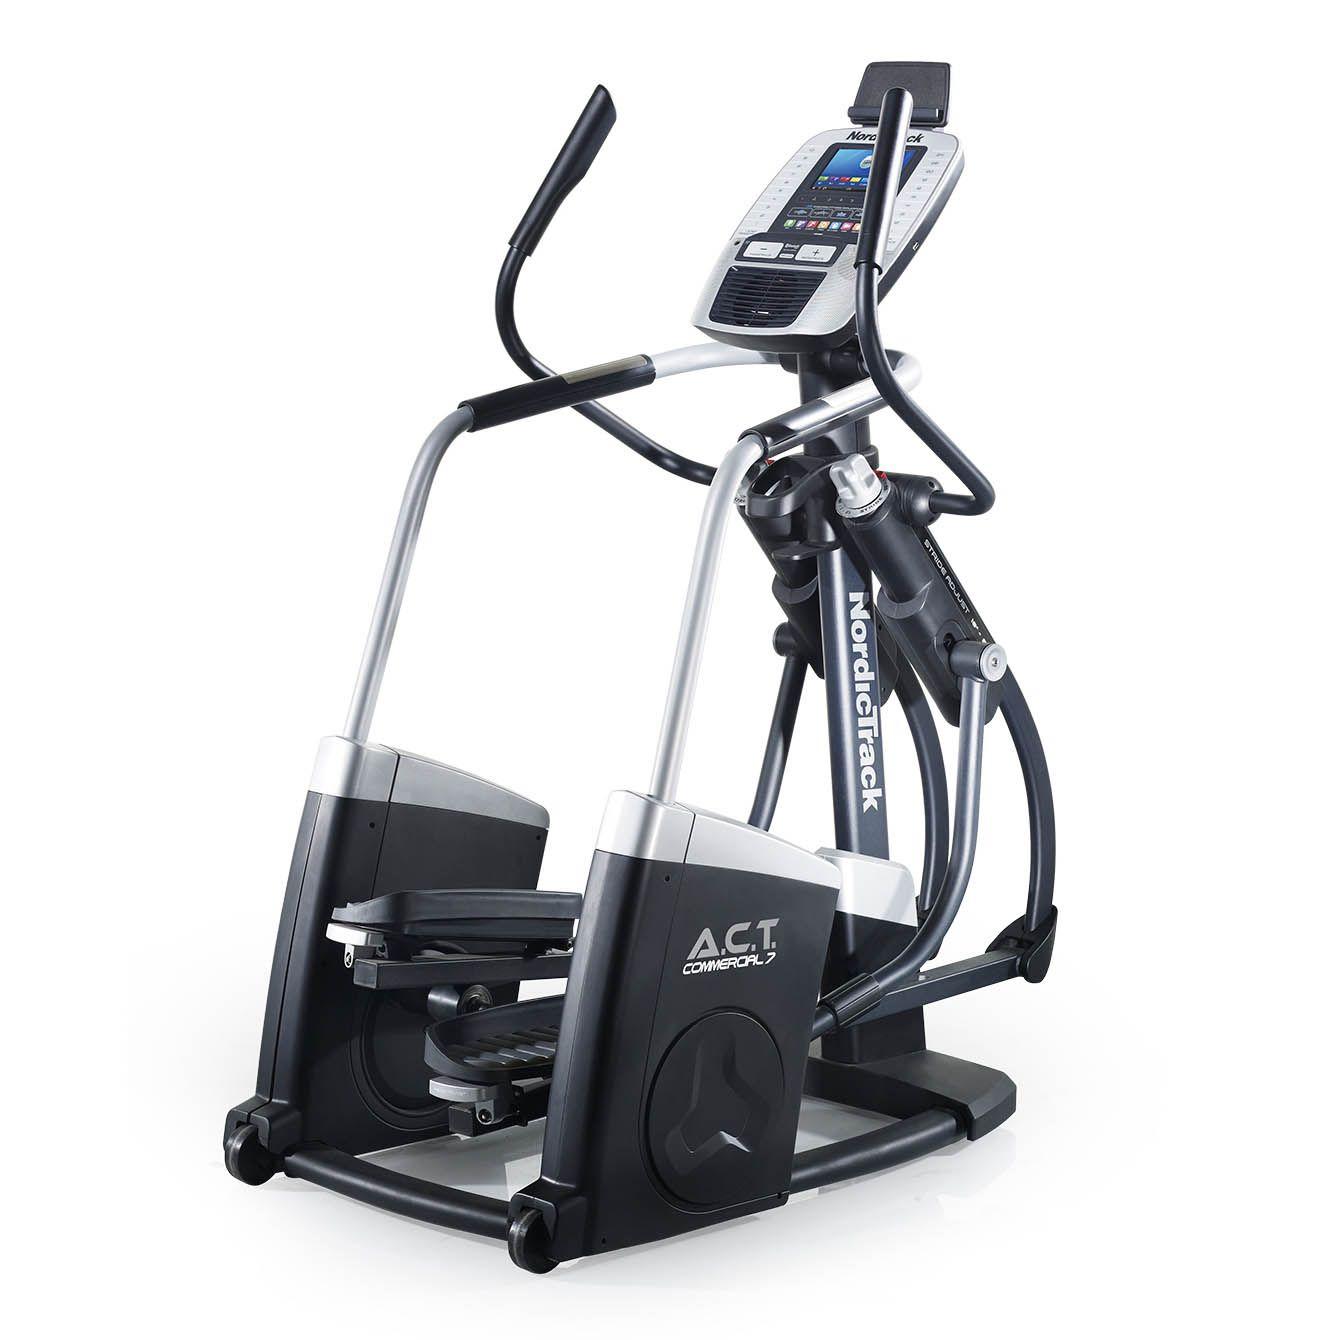 NordicTrack A.C.T. Commercial 7 Elliptical Cross Trainer